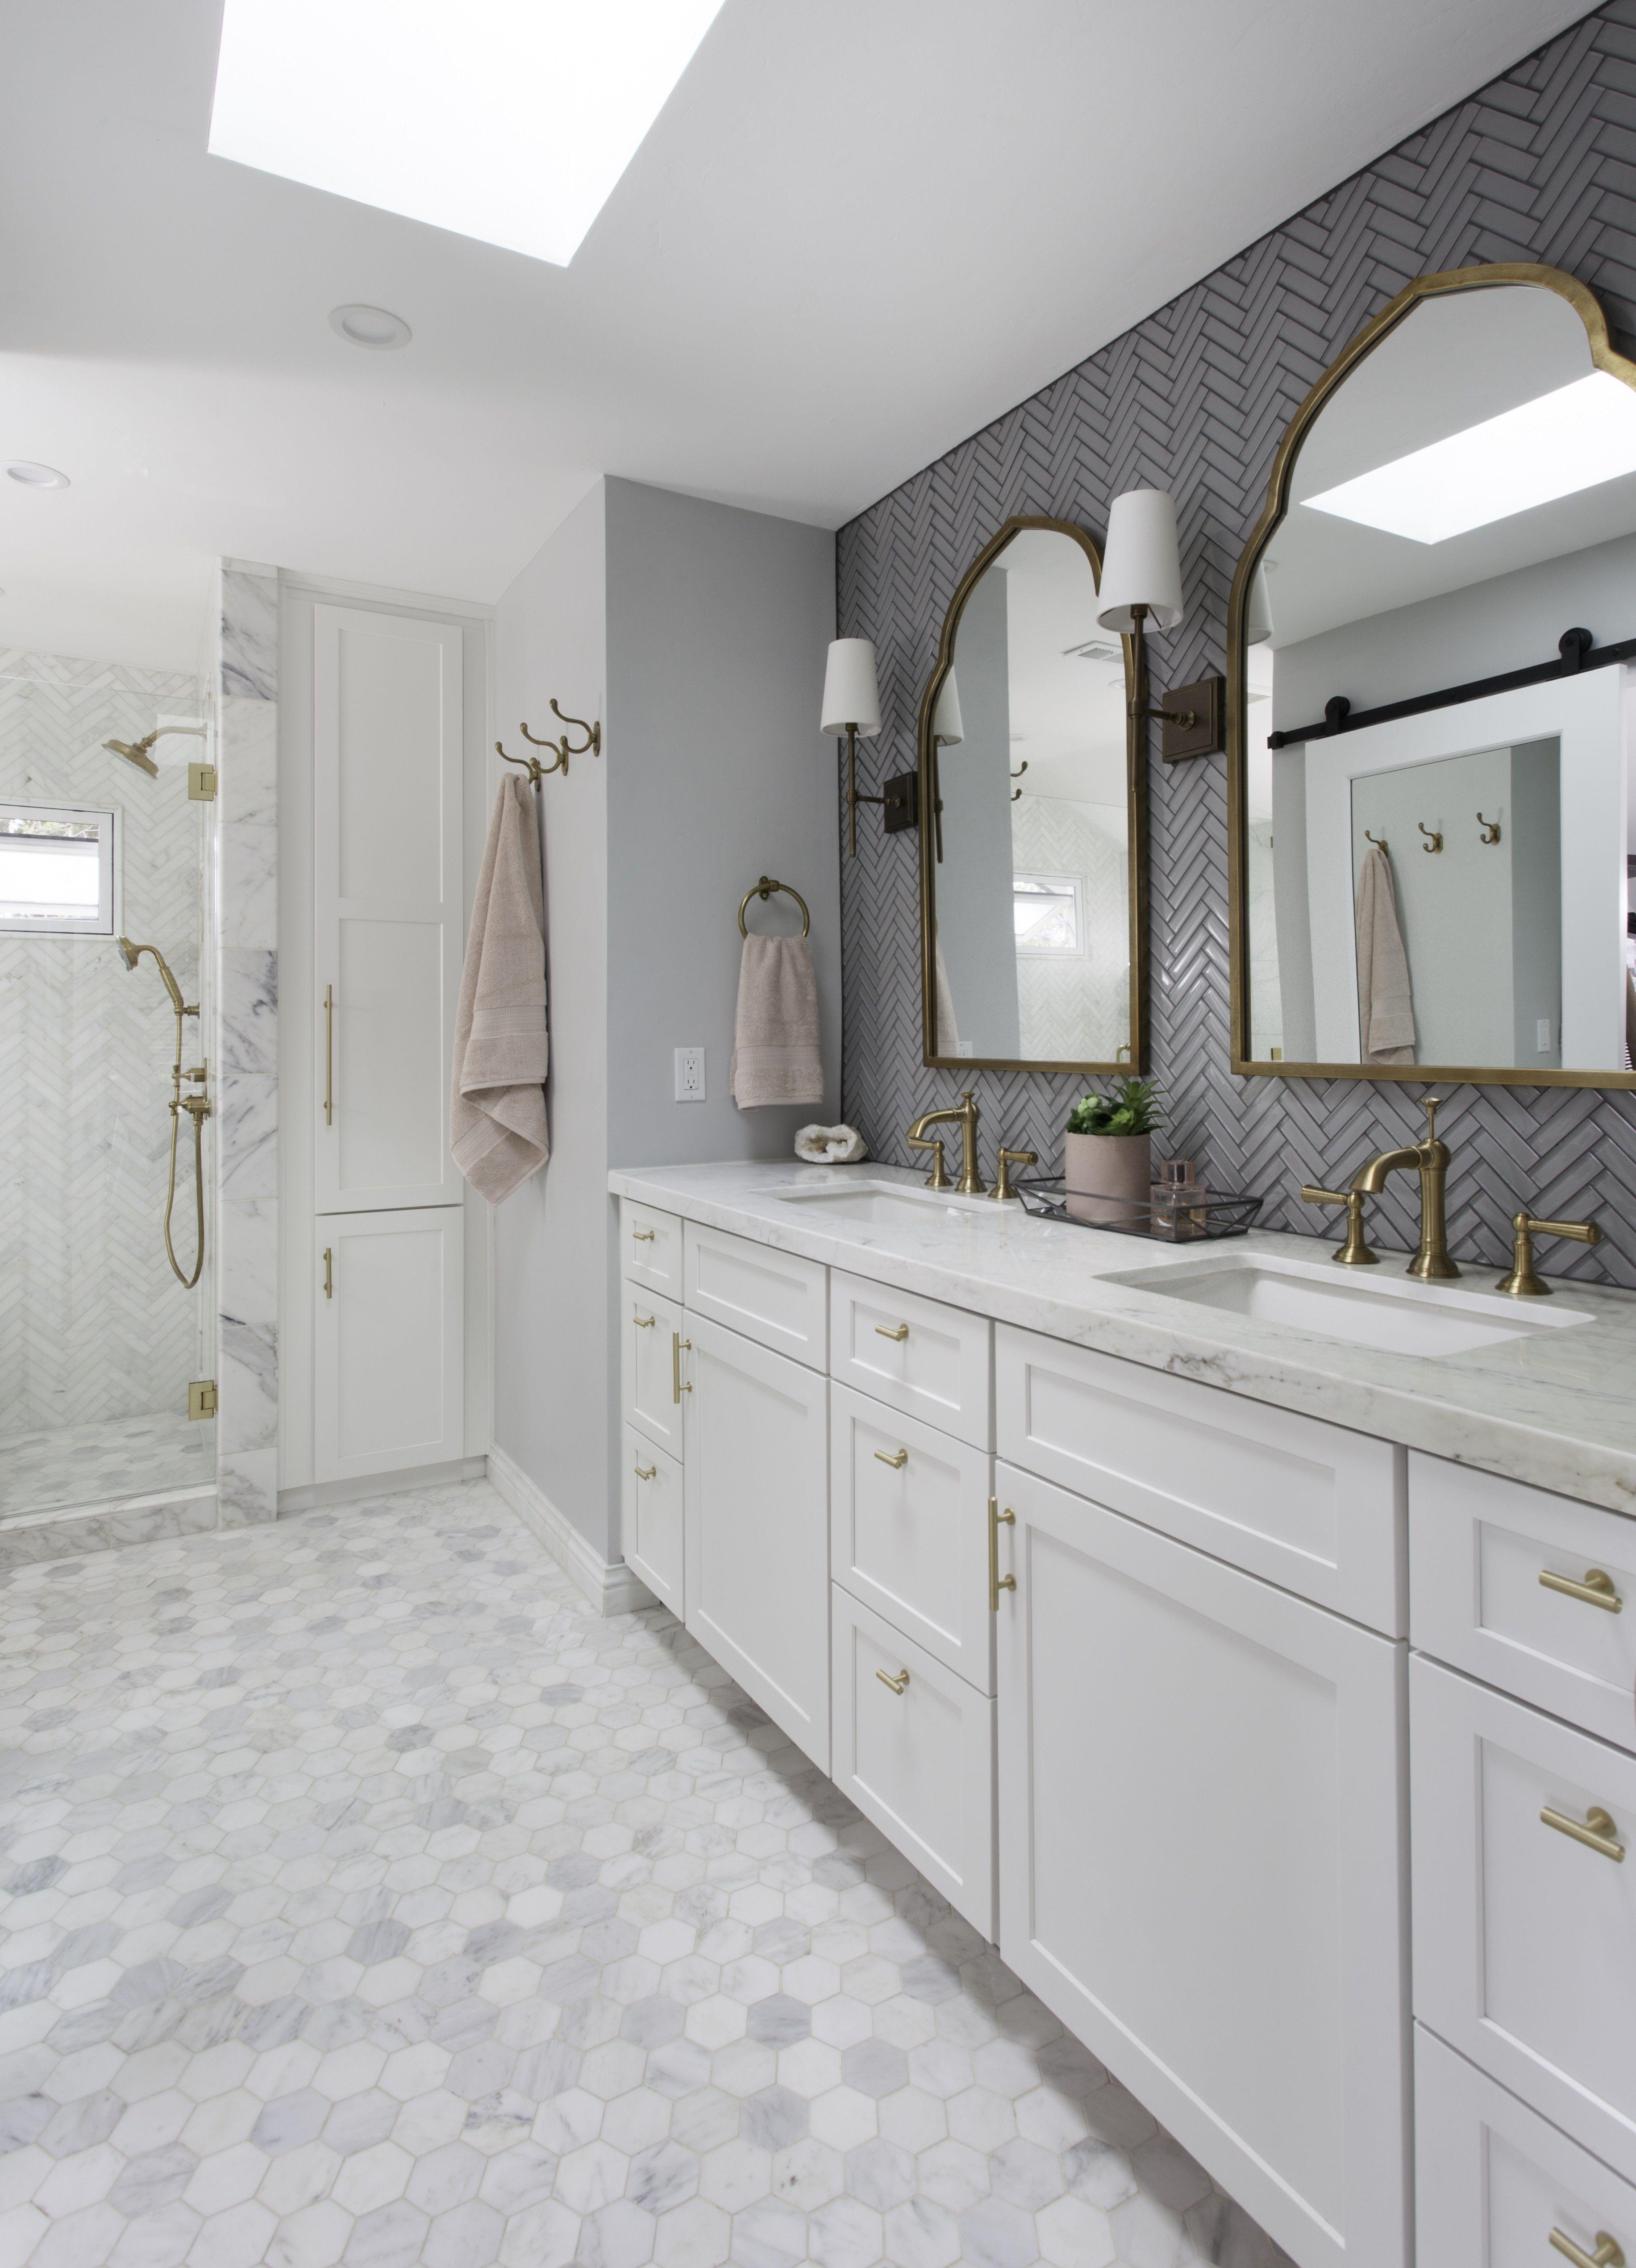 Signature Designs Kitchen Bath Classic Marble Bathroom Remodel My New Bathroom Proektirovanie Doma Mramornye Vannye Komnaty Dom